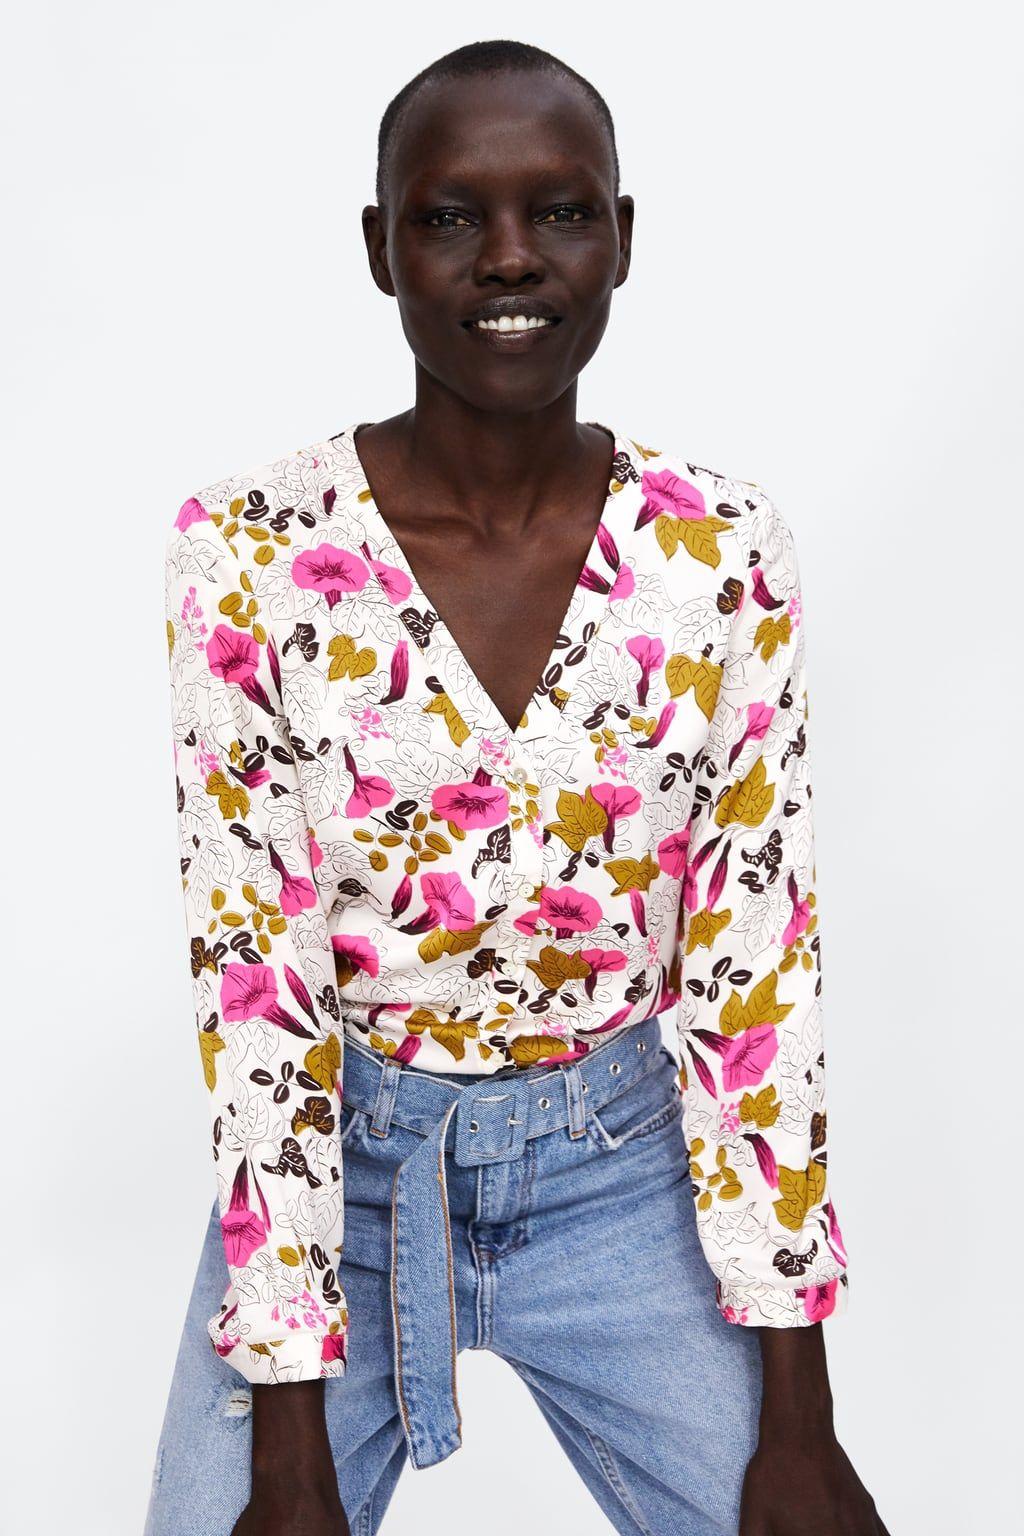 Zara Dan 2 Cicek Desenli Gomlek Resmi High Fashion Street Style Fashion Floral Print Shirt